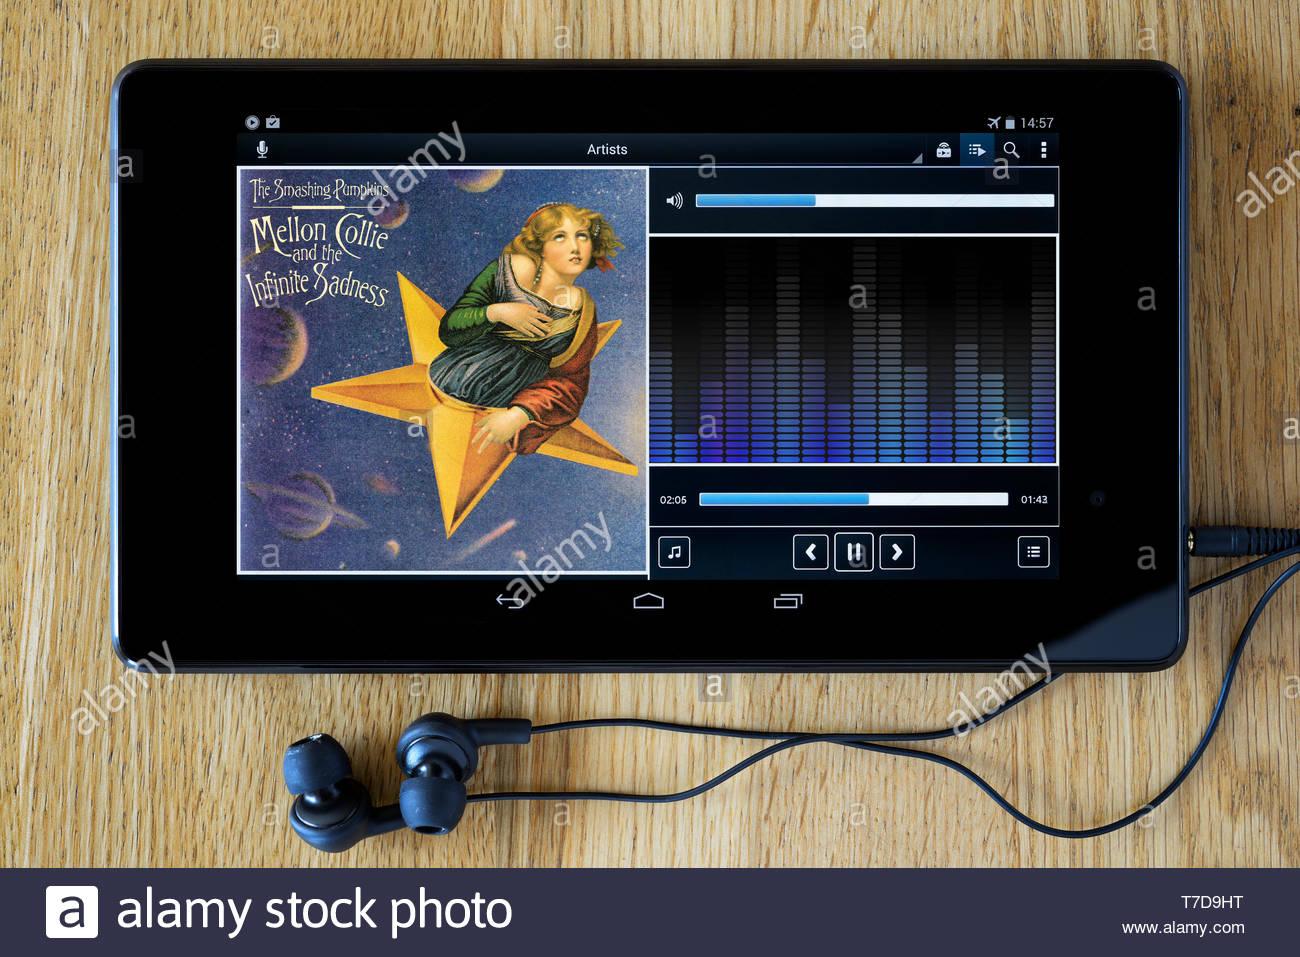 The Smashing Pumpkins, Mellon Collie and the Infinite Sadness MP3 album art on PC tablet, England - Stock Image